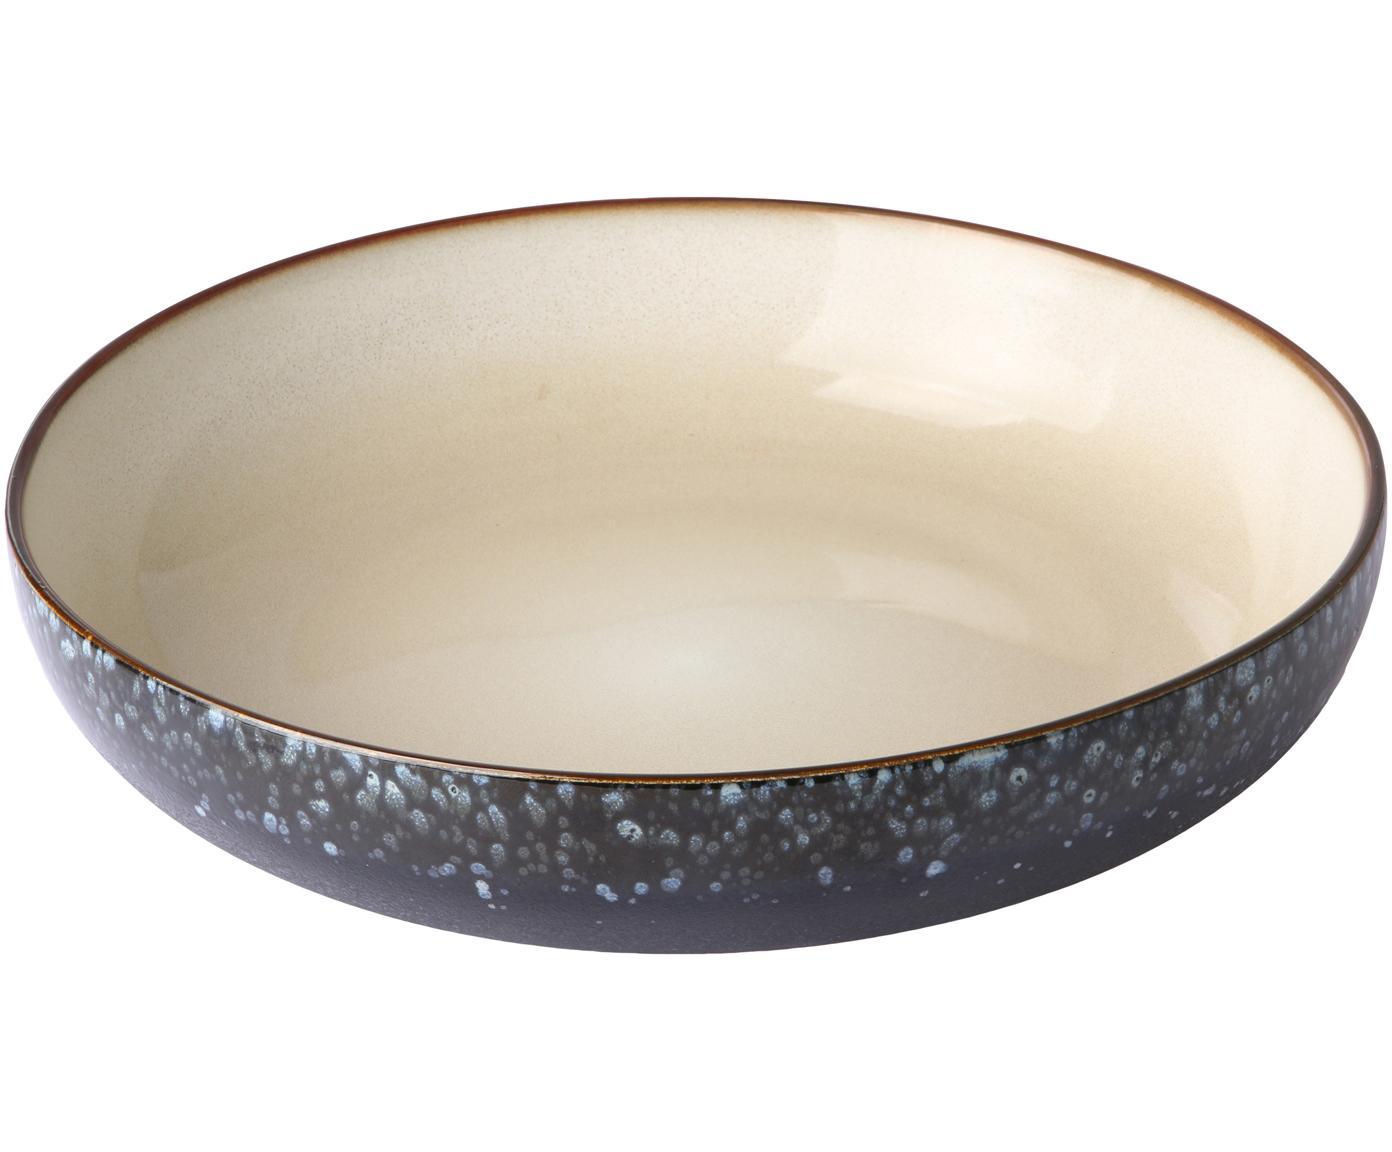 Ciotola fatta a mano 70's, Ceramica, Nero, beige, tonalità blu, Ø 27 x Alt. 6 cm